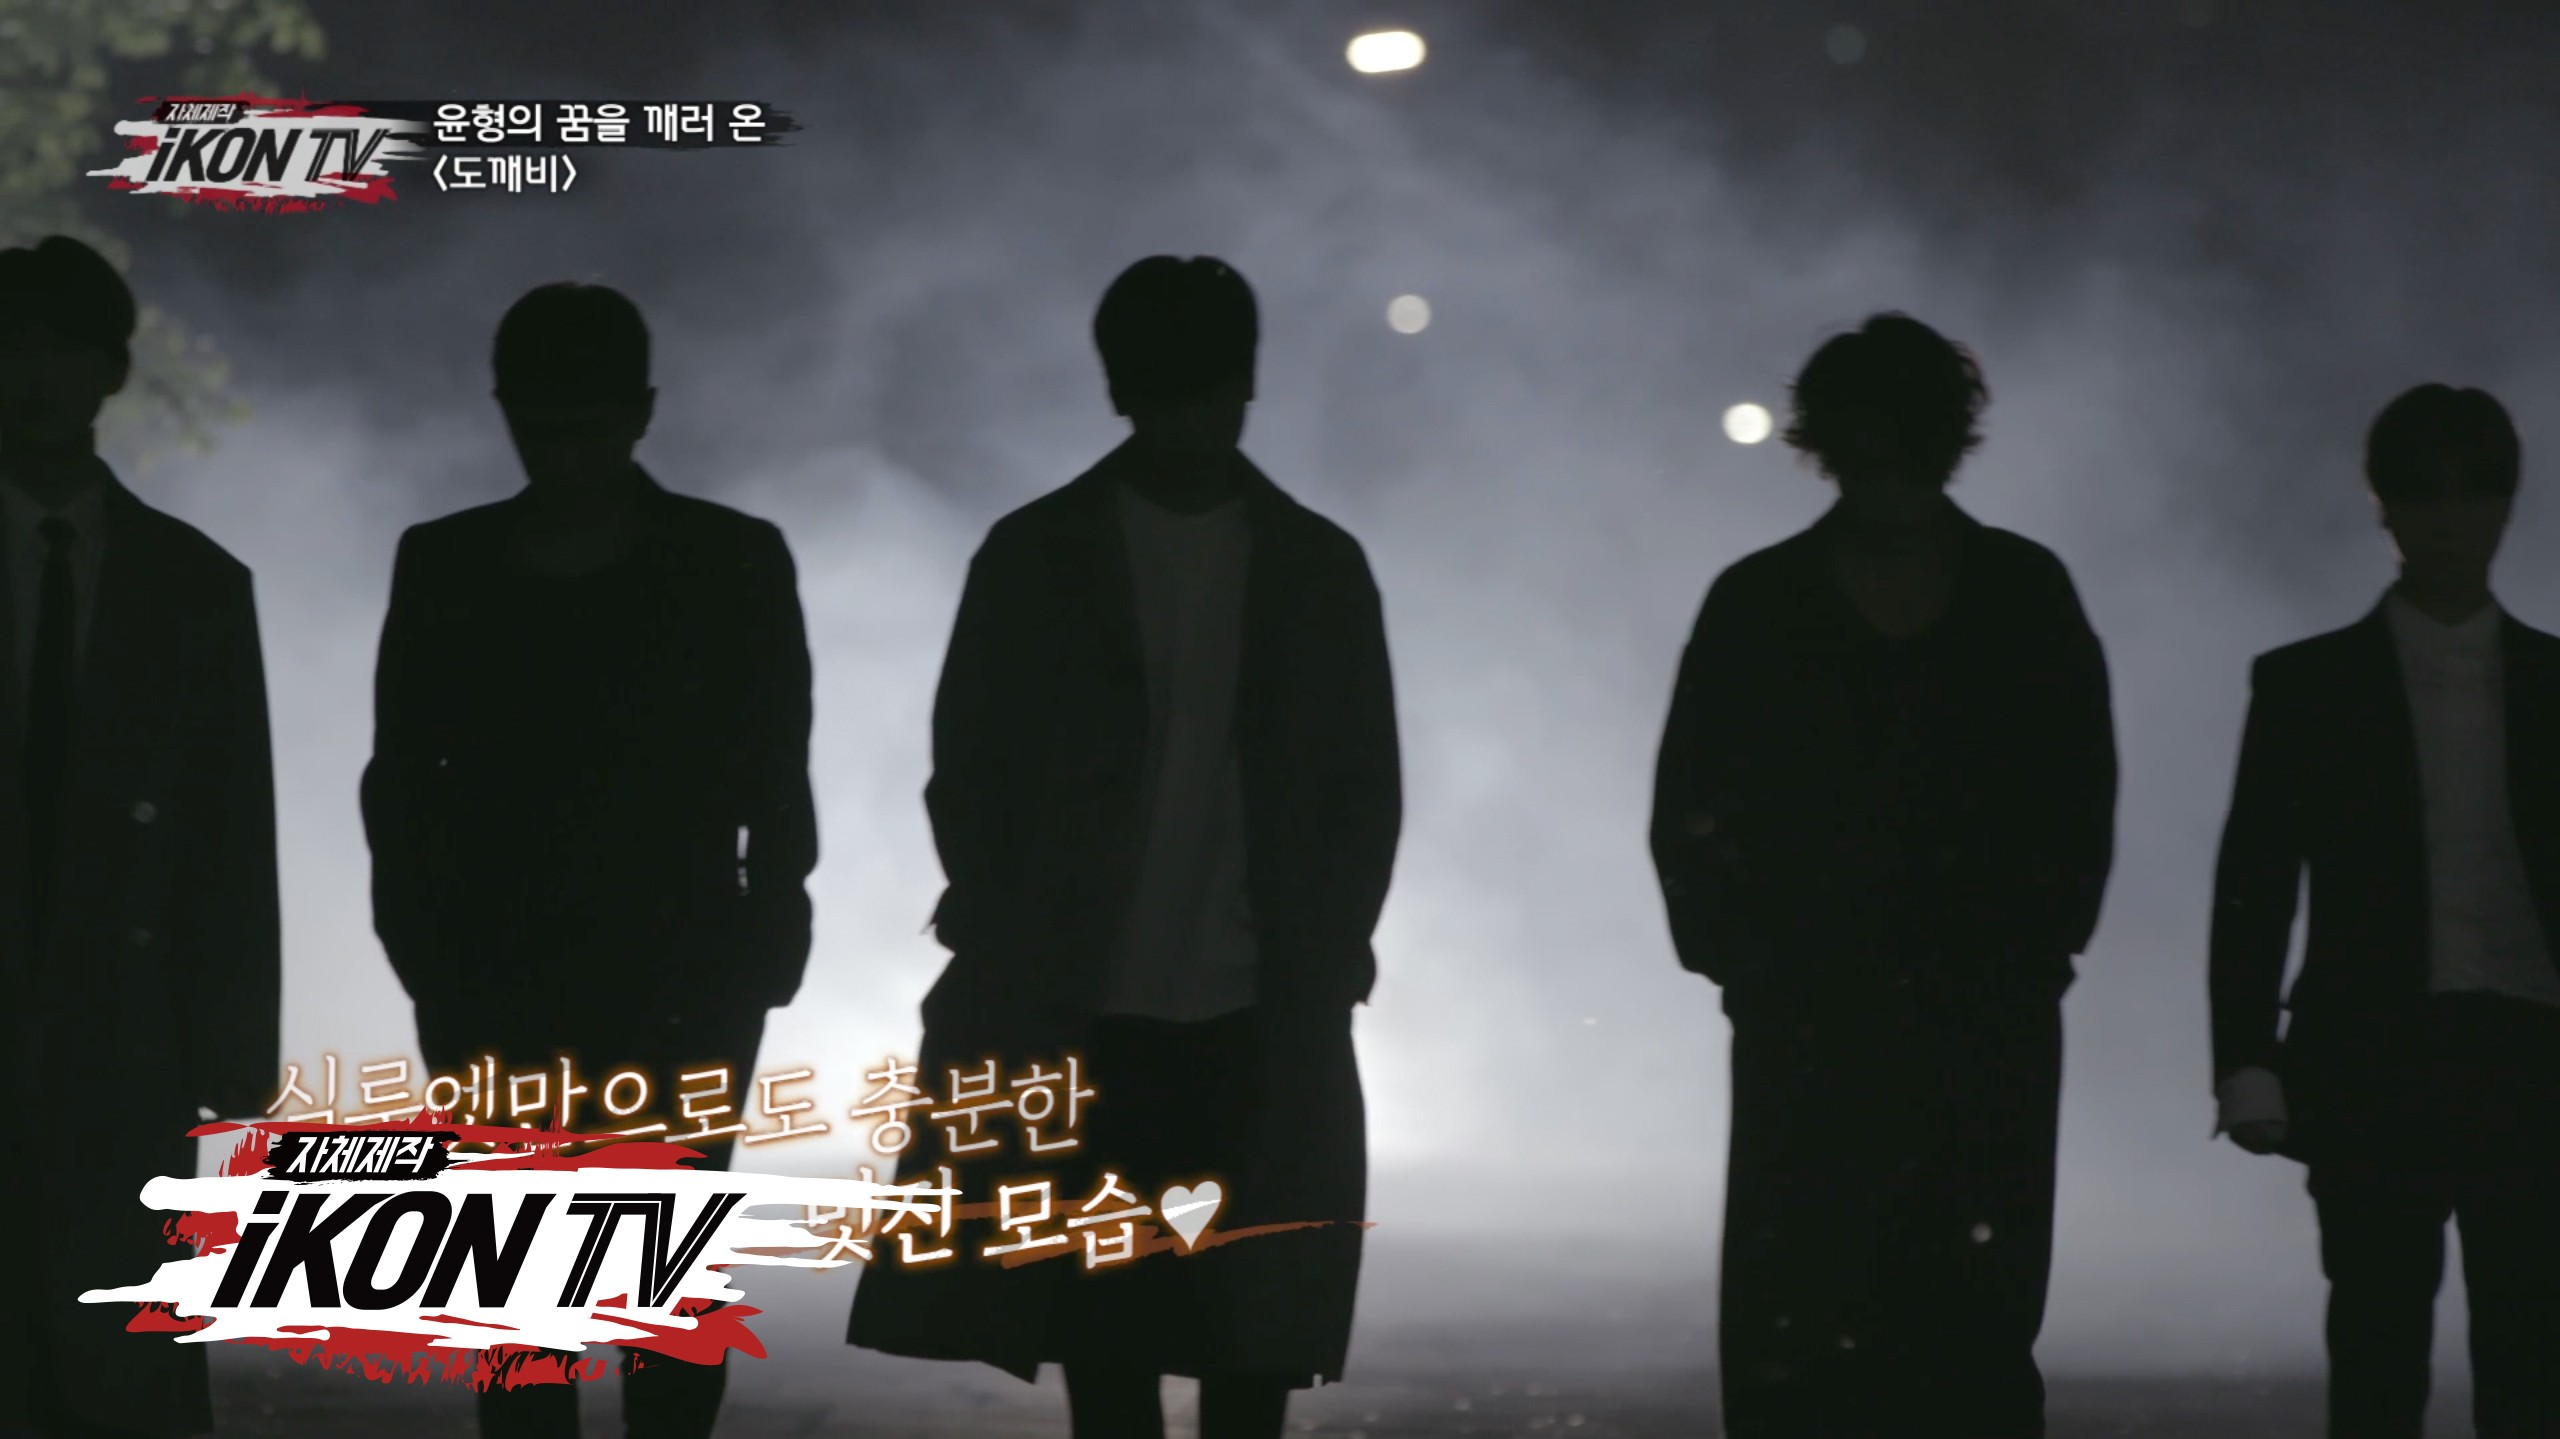 iKON - '자체제작 iKON TV' EP.8-5